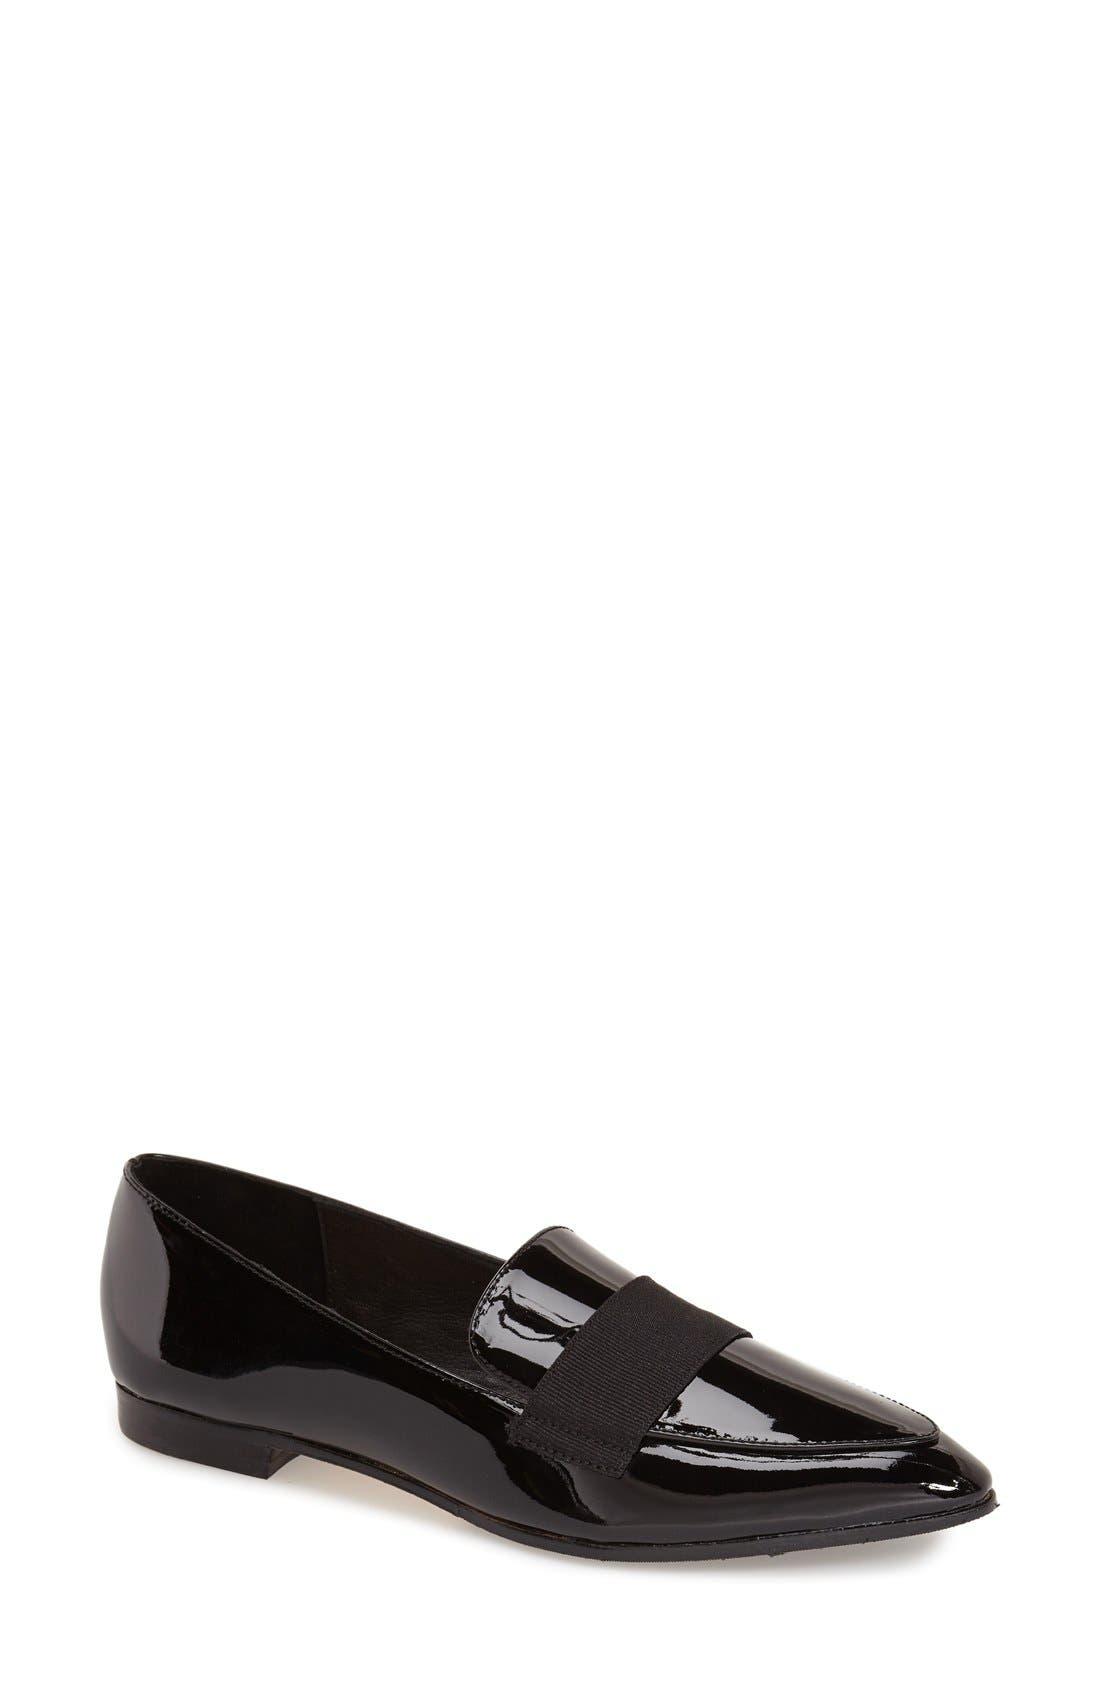 Main Image - kate spade new york 'corina' pointy toe loafer (Women)